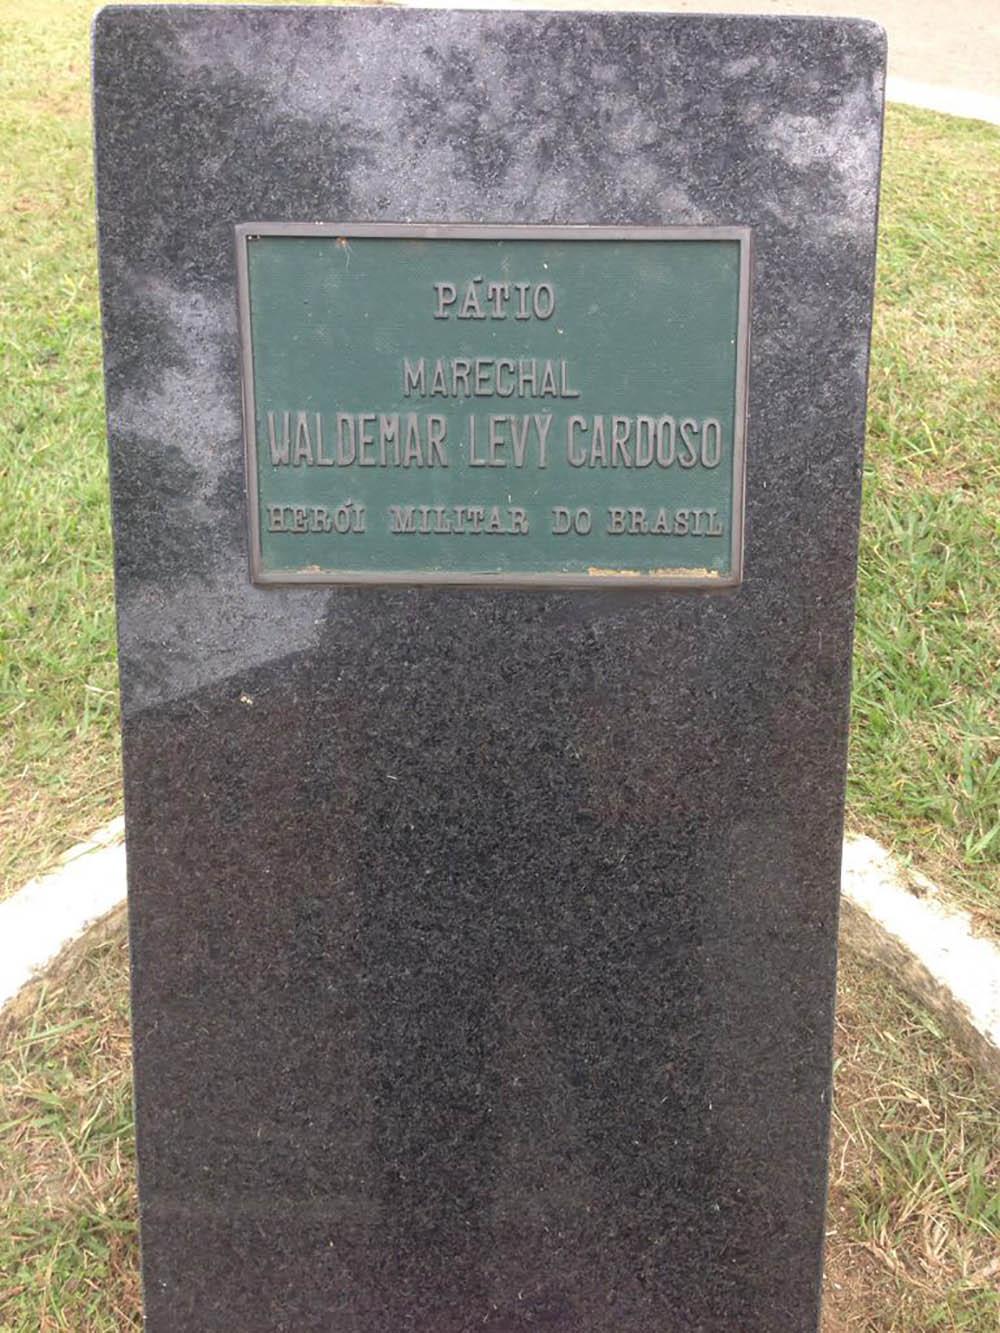 Memorial Marshall Waldemar Levy Cardoso